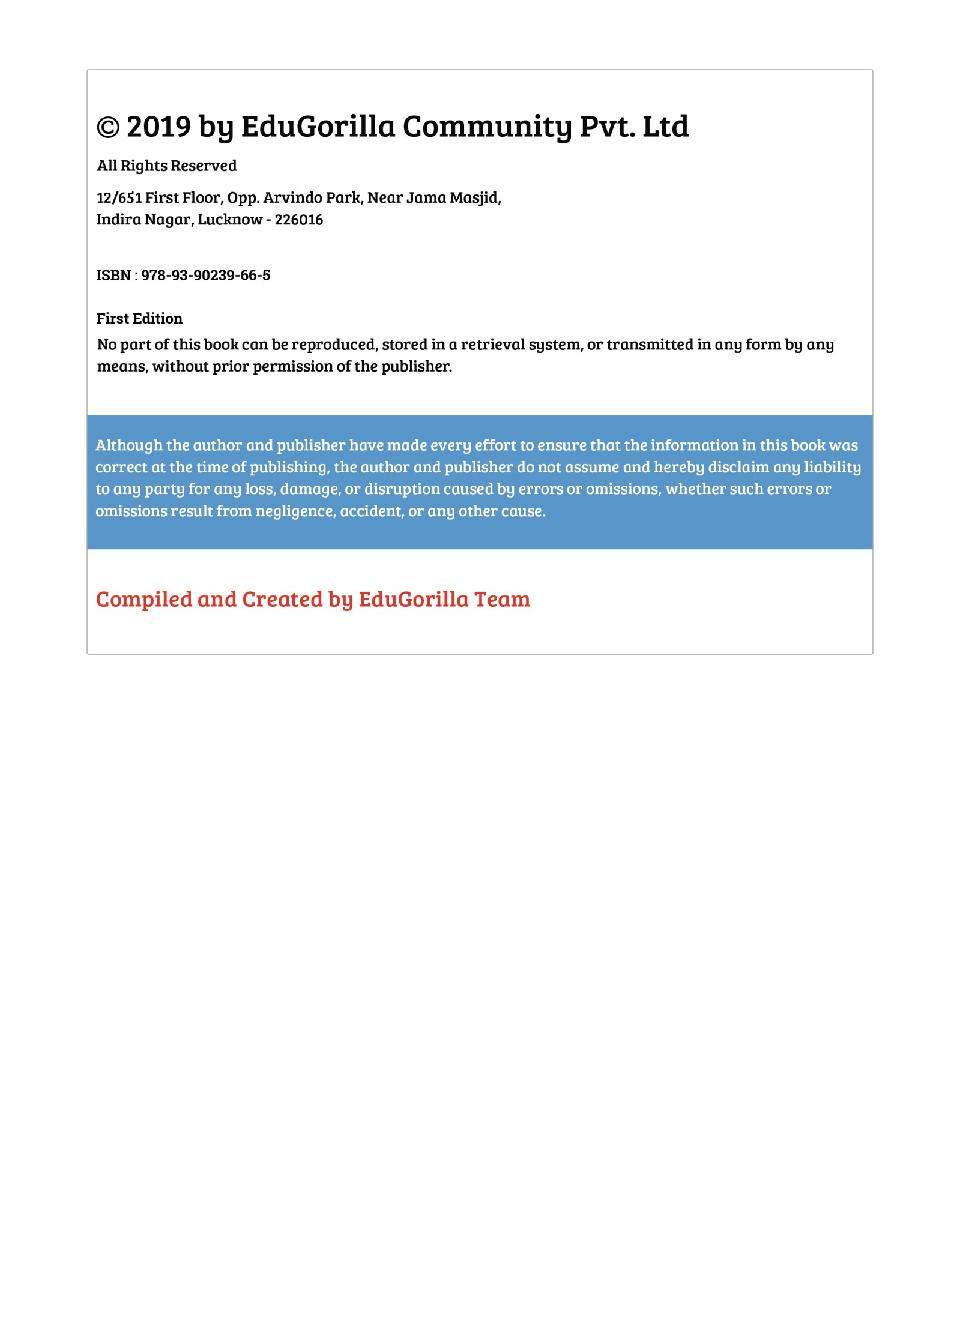 EduGorilla LIC ADO Prelims Exam 2020 | 15 Mock Test - Page 4